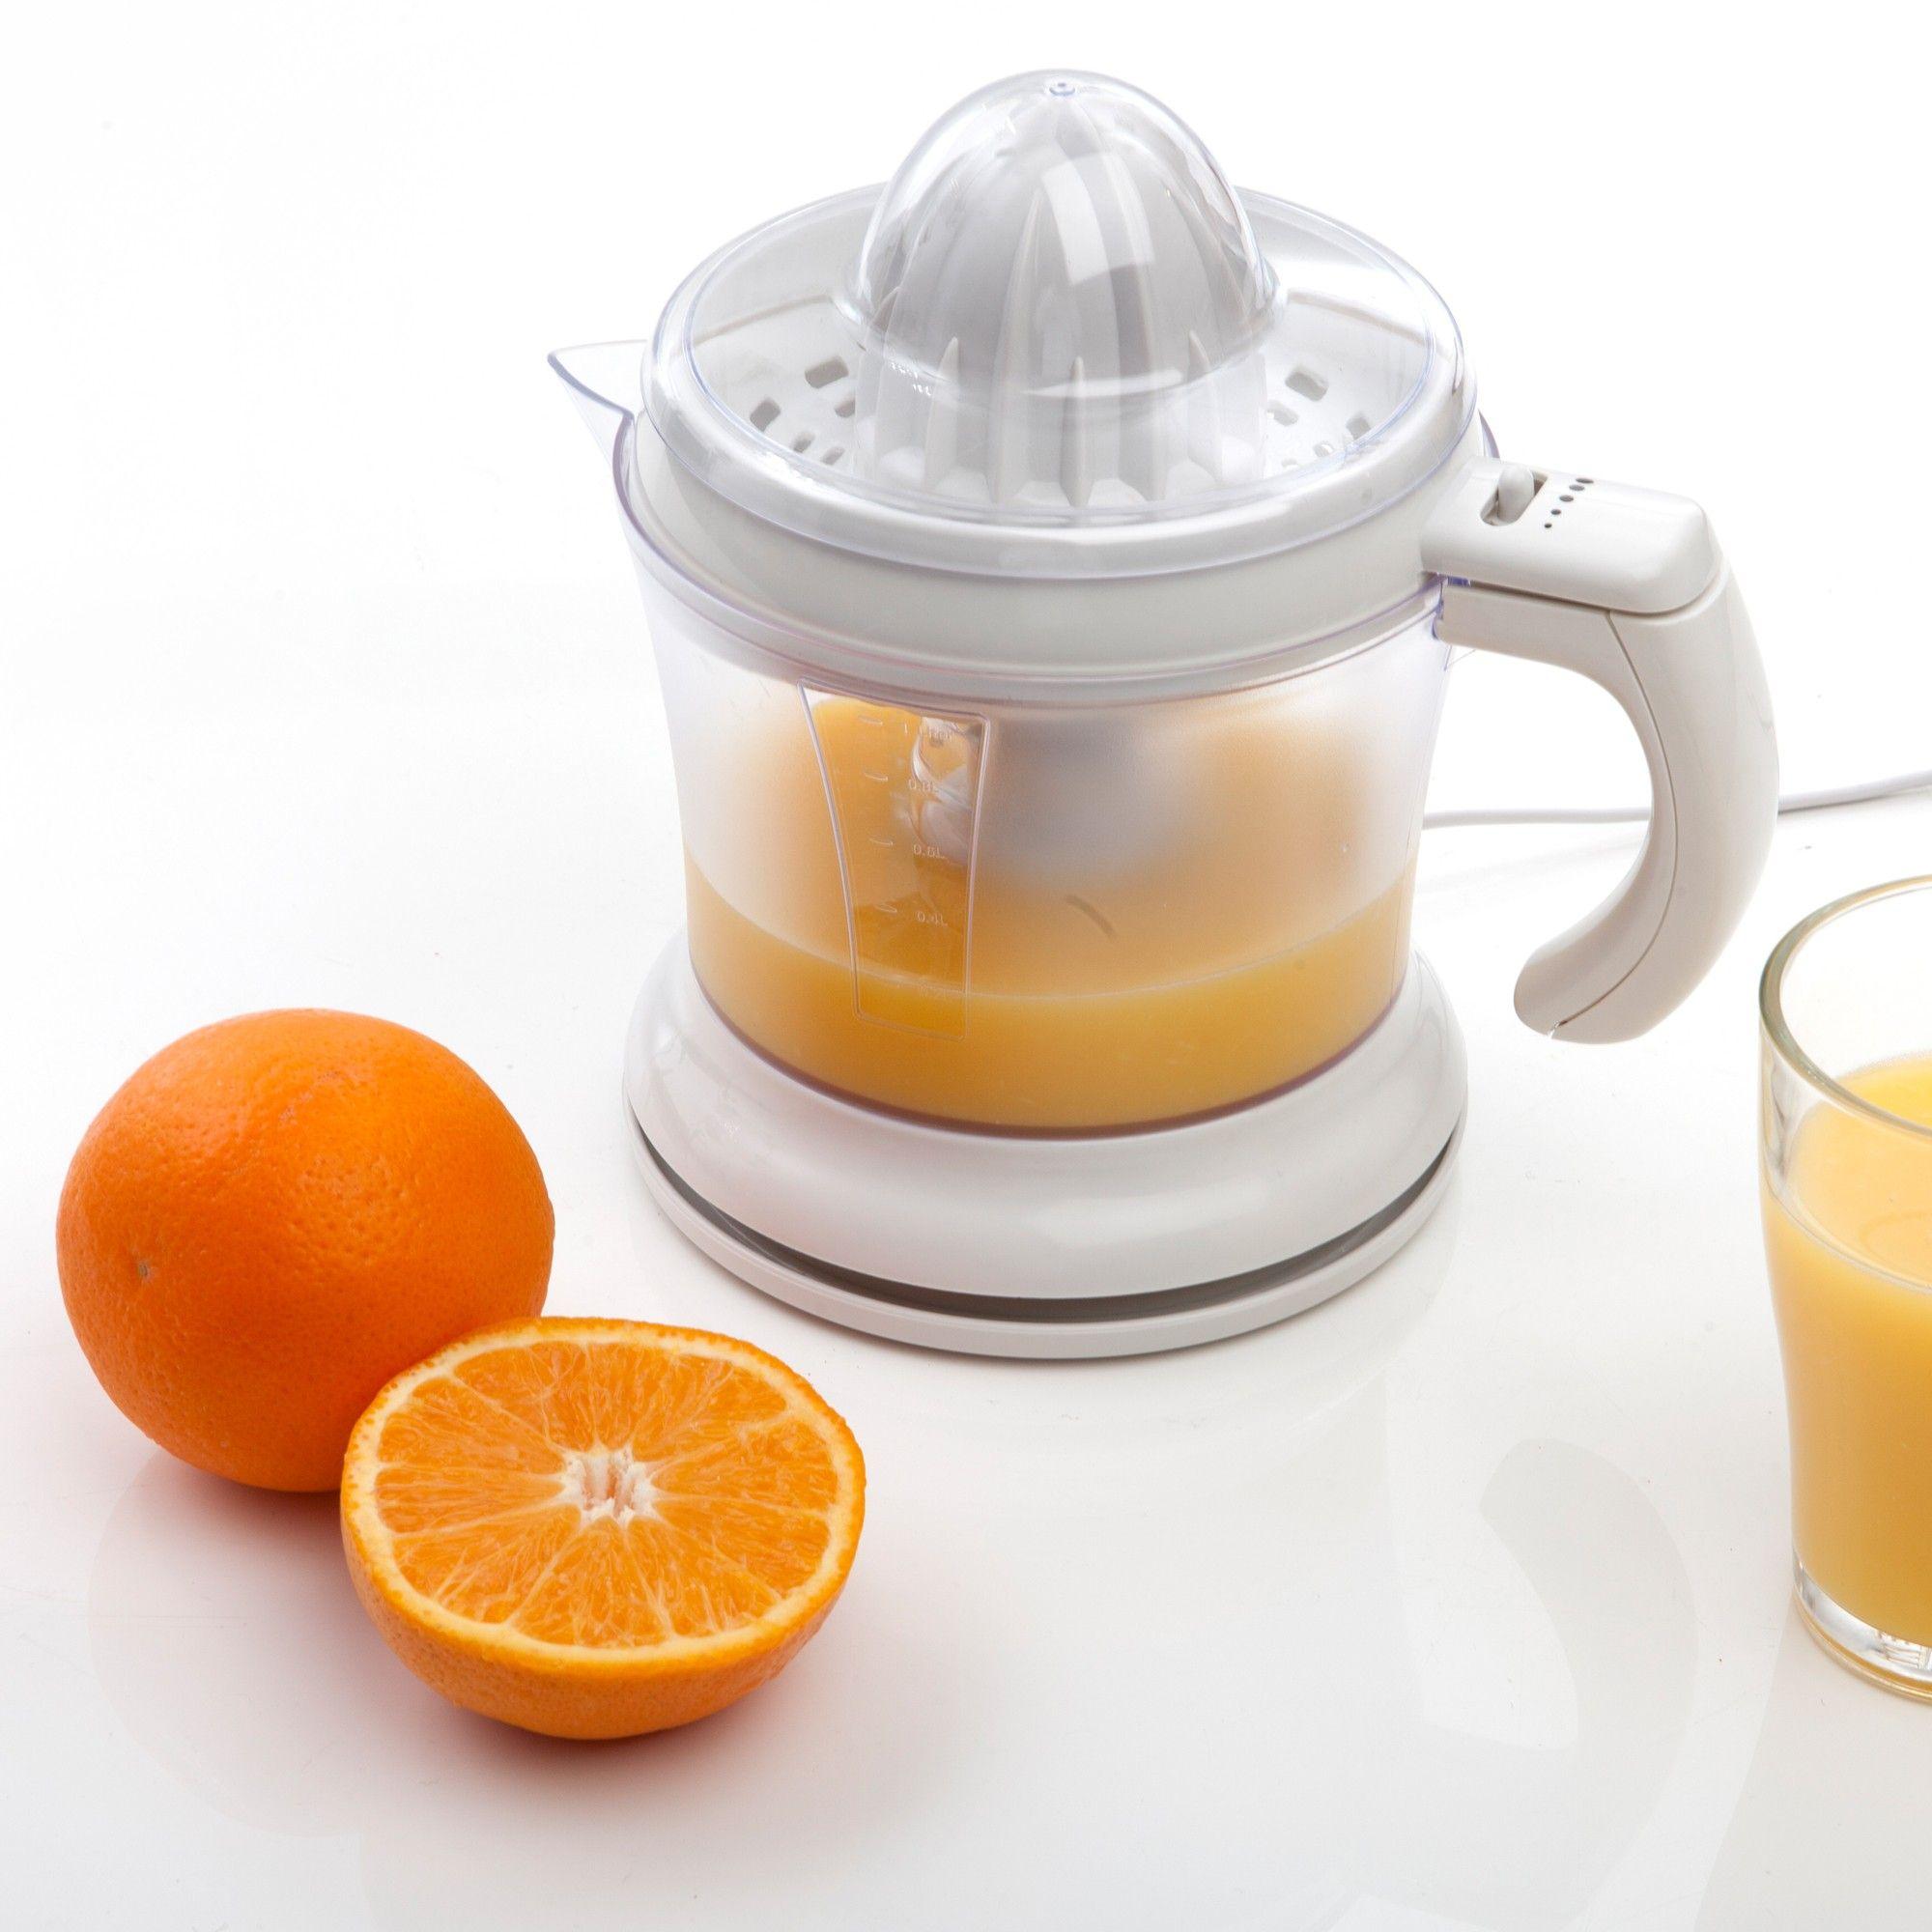 Electric citrus juicer citrus juicer juicer citrus